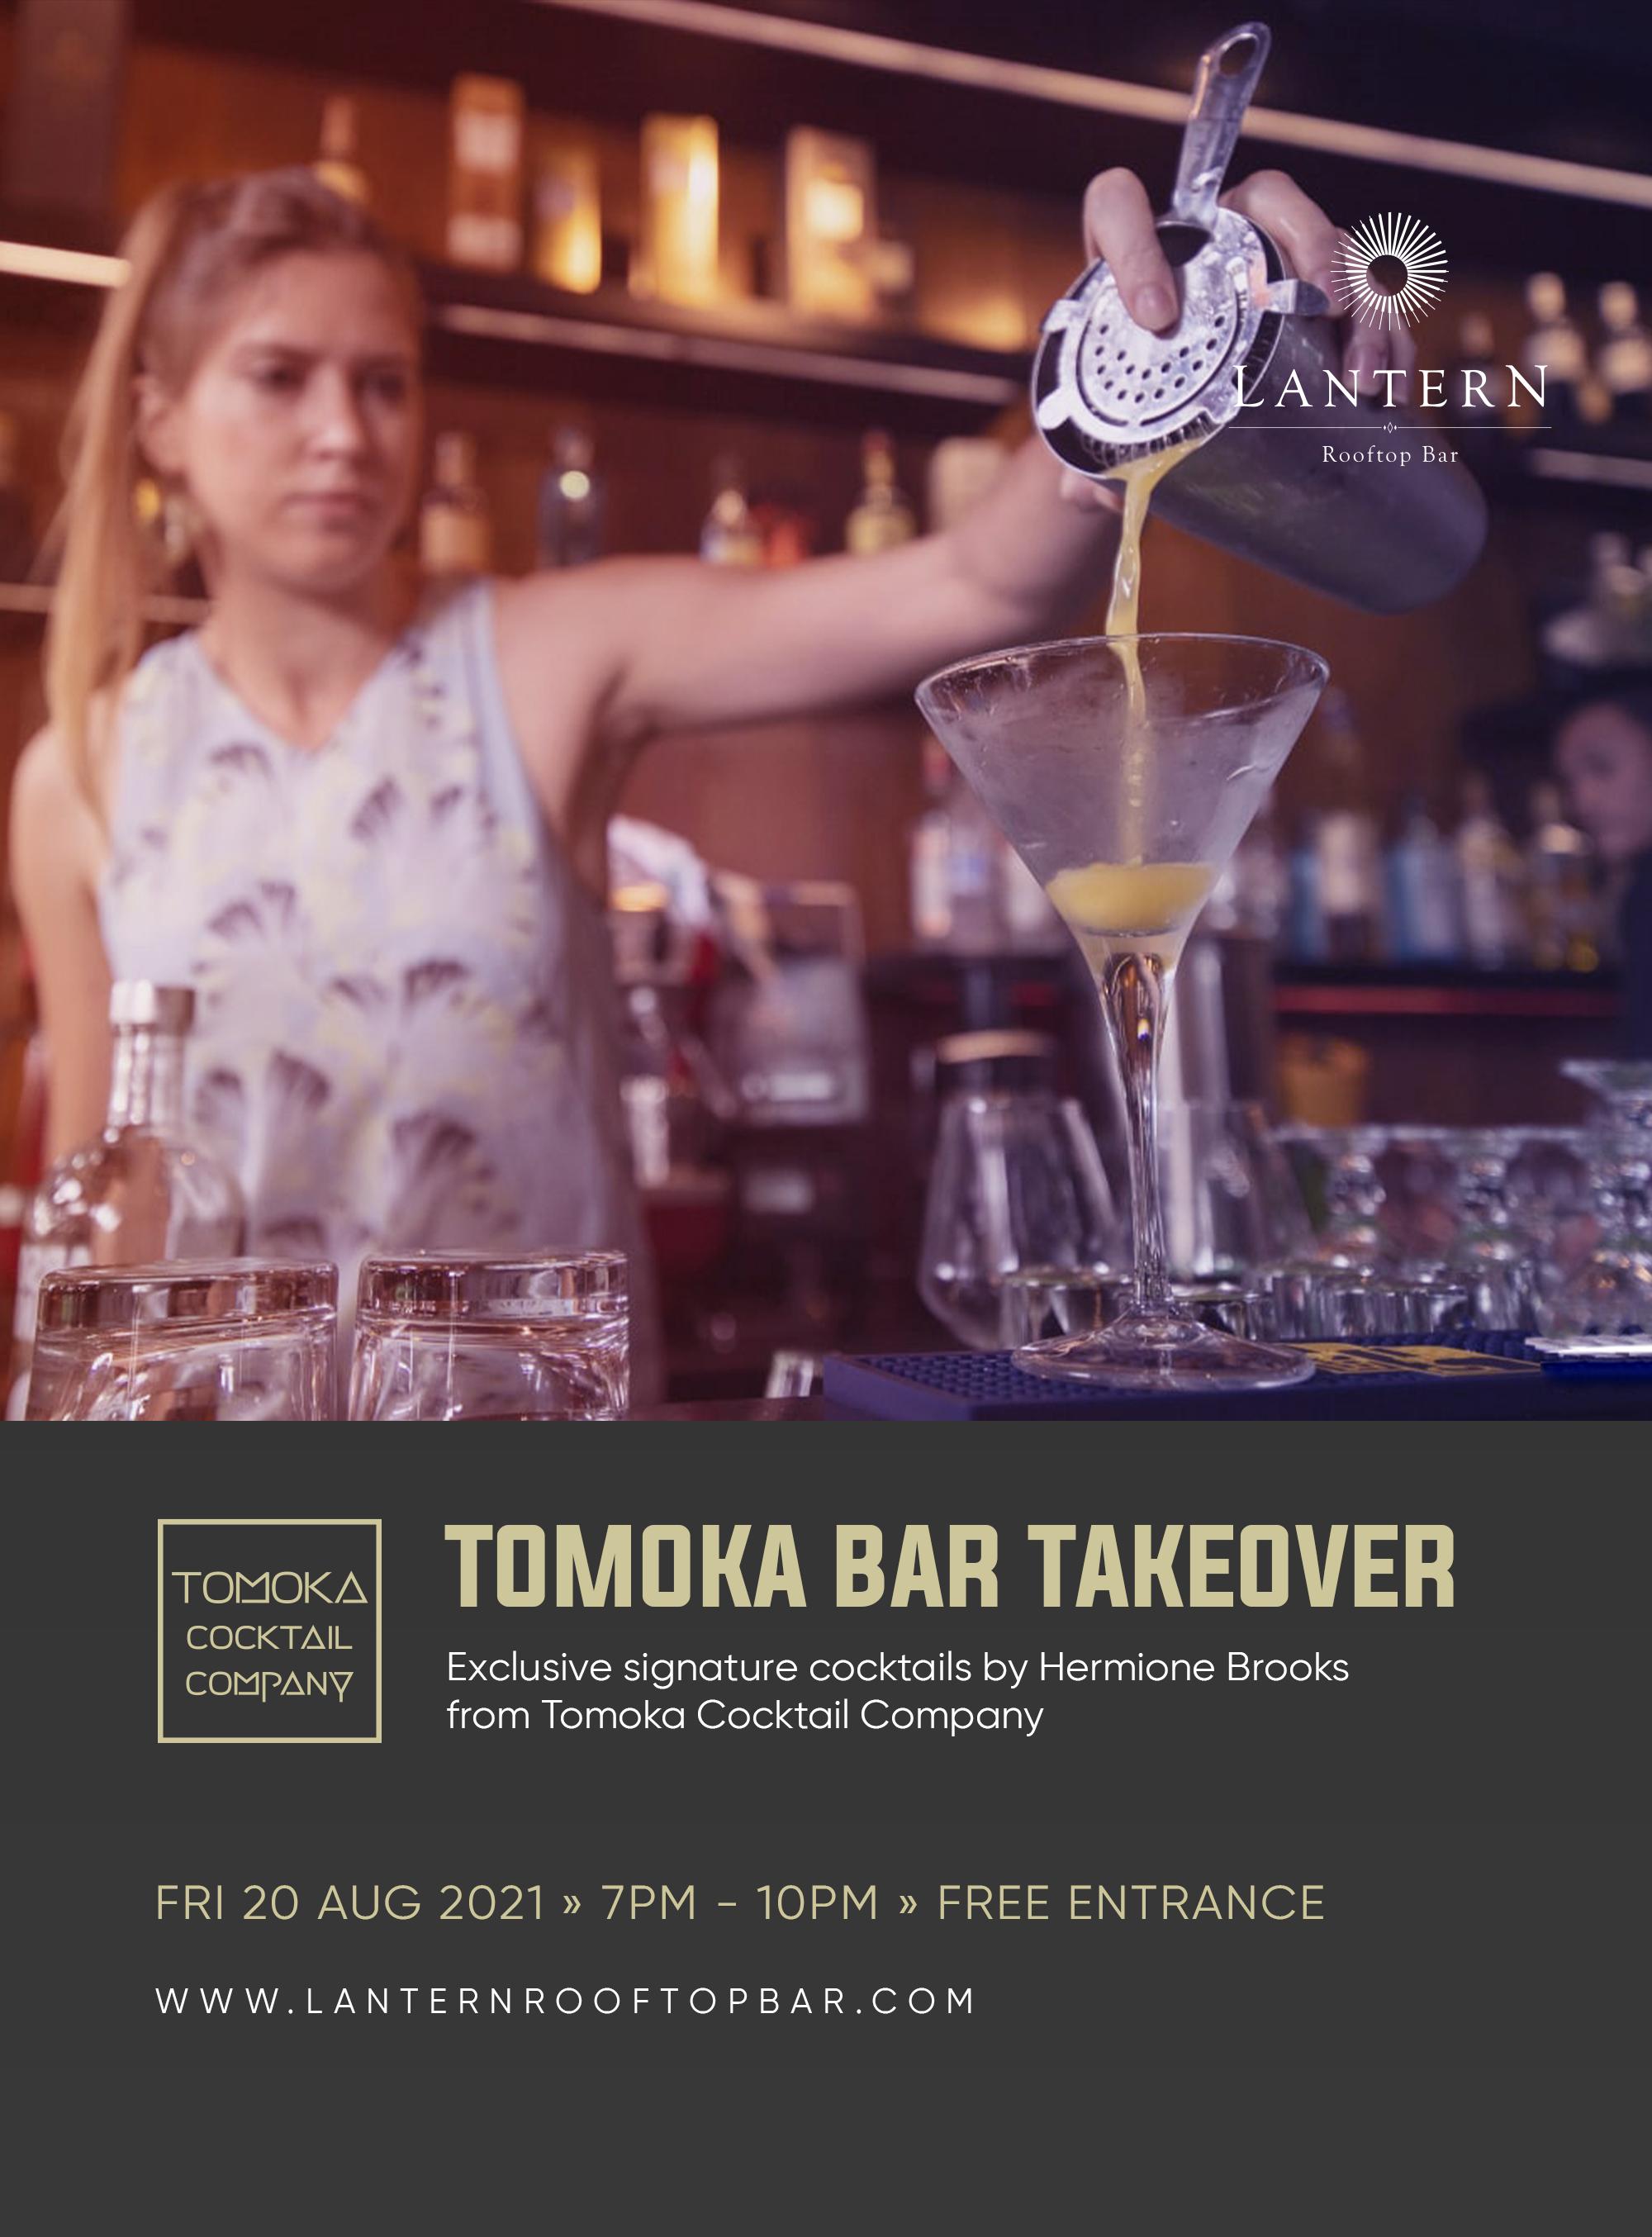 Tomoka Bar Takeover